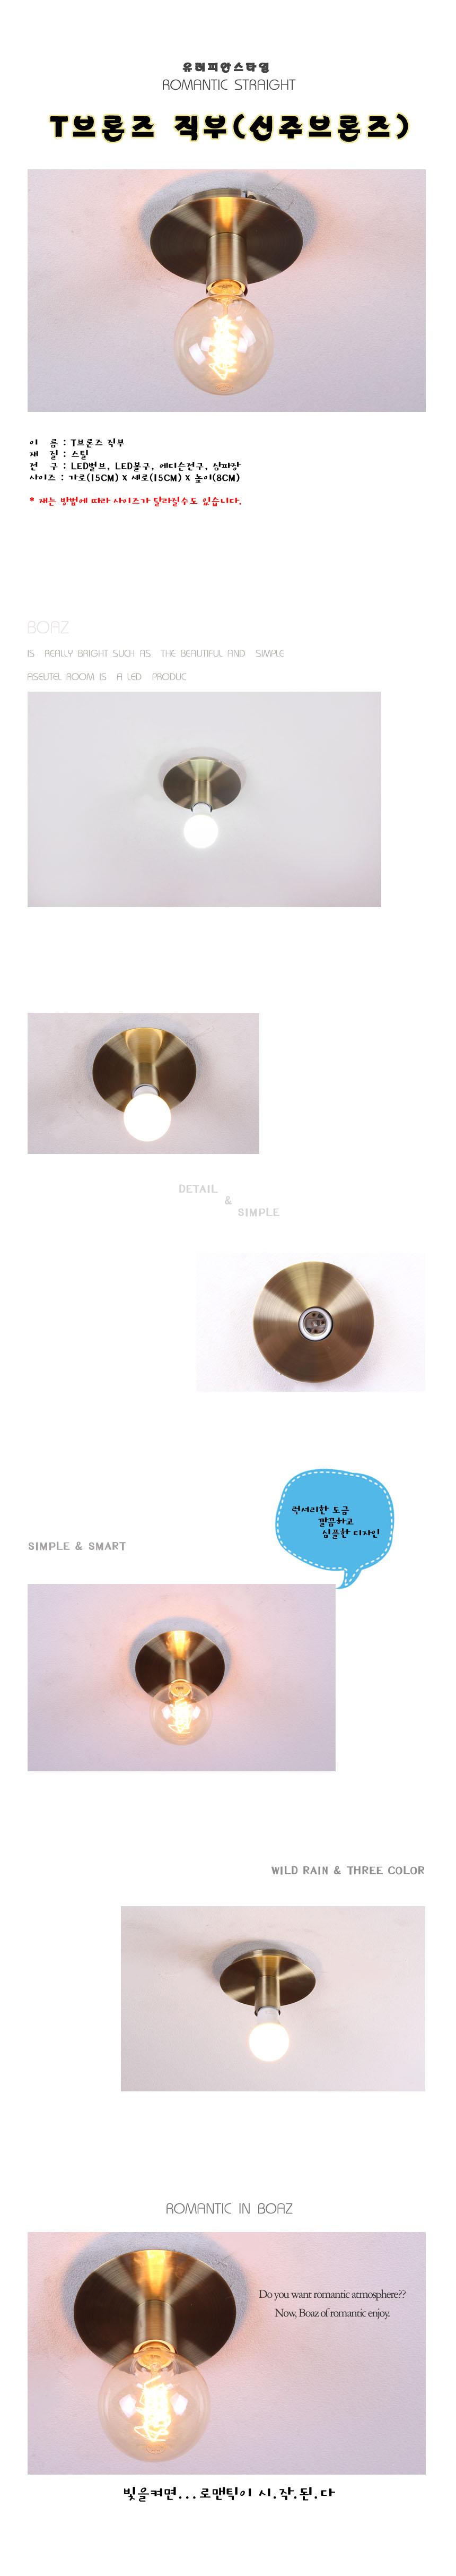 boaz T브론즈(신주) - 보아스라이팅, 20,000원, 리빙조명, 방등/천장등